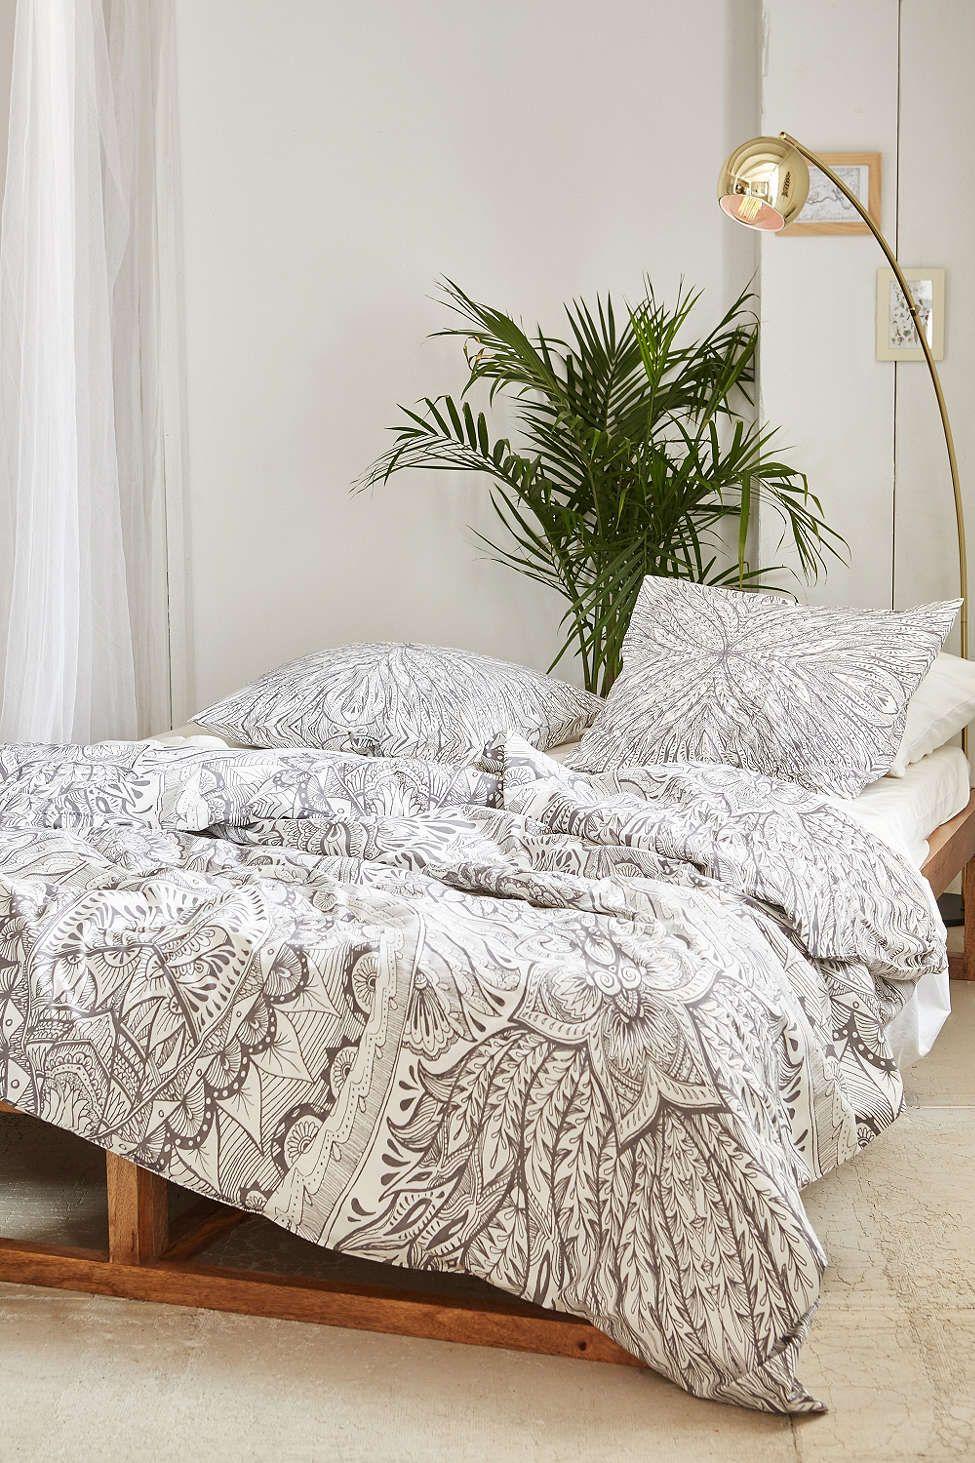 plum u0026 bow medallion duvet cover duvet covers queenbed sheetsbed - Queen Bed Sheets